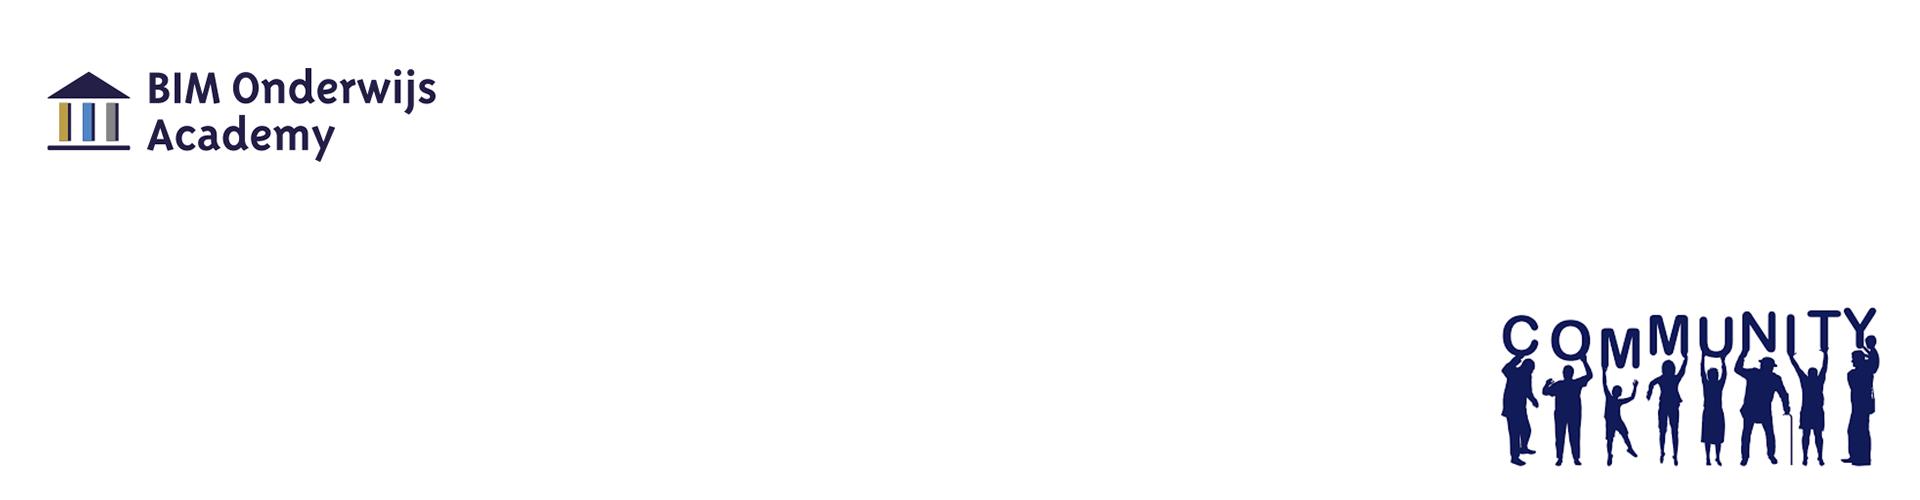 Bim onderwijsdag logo community